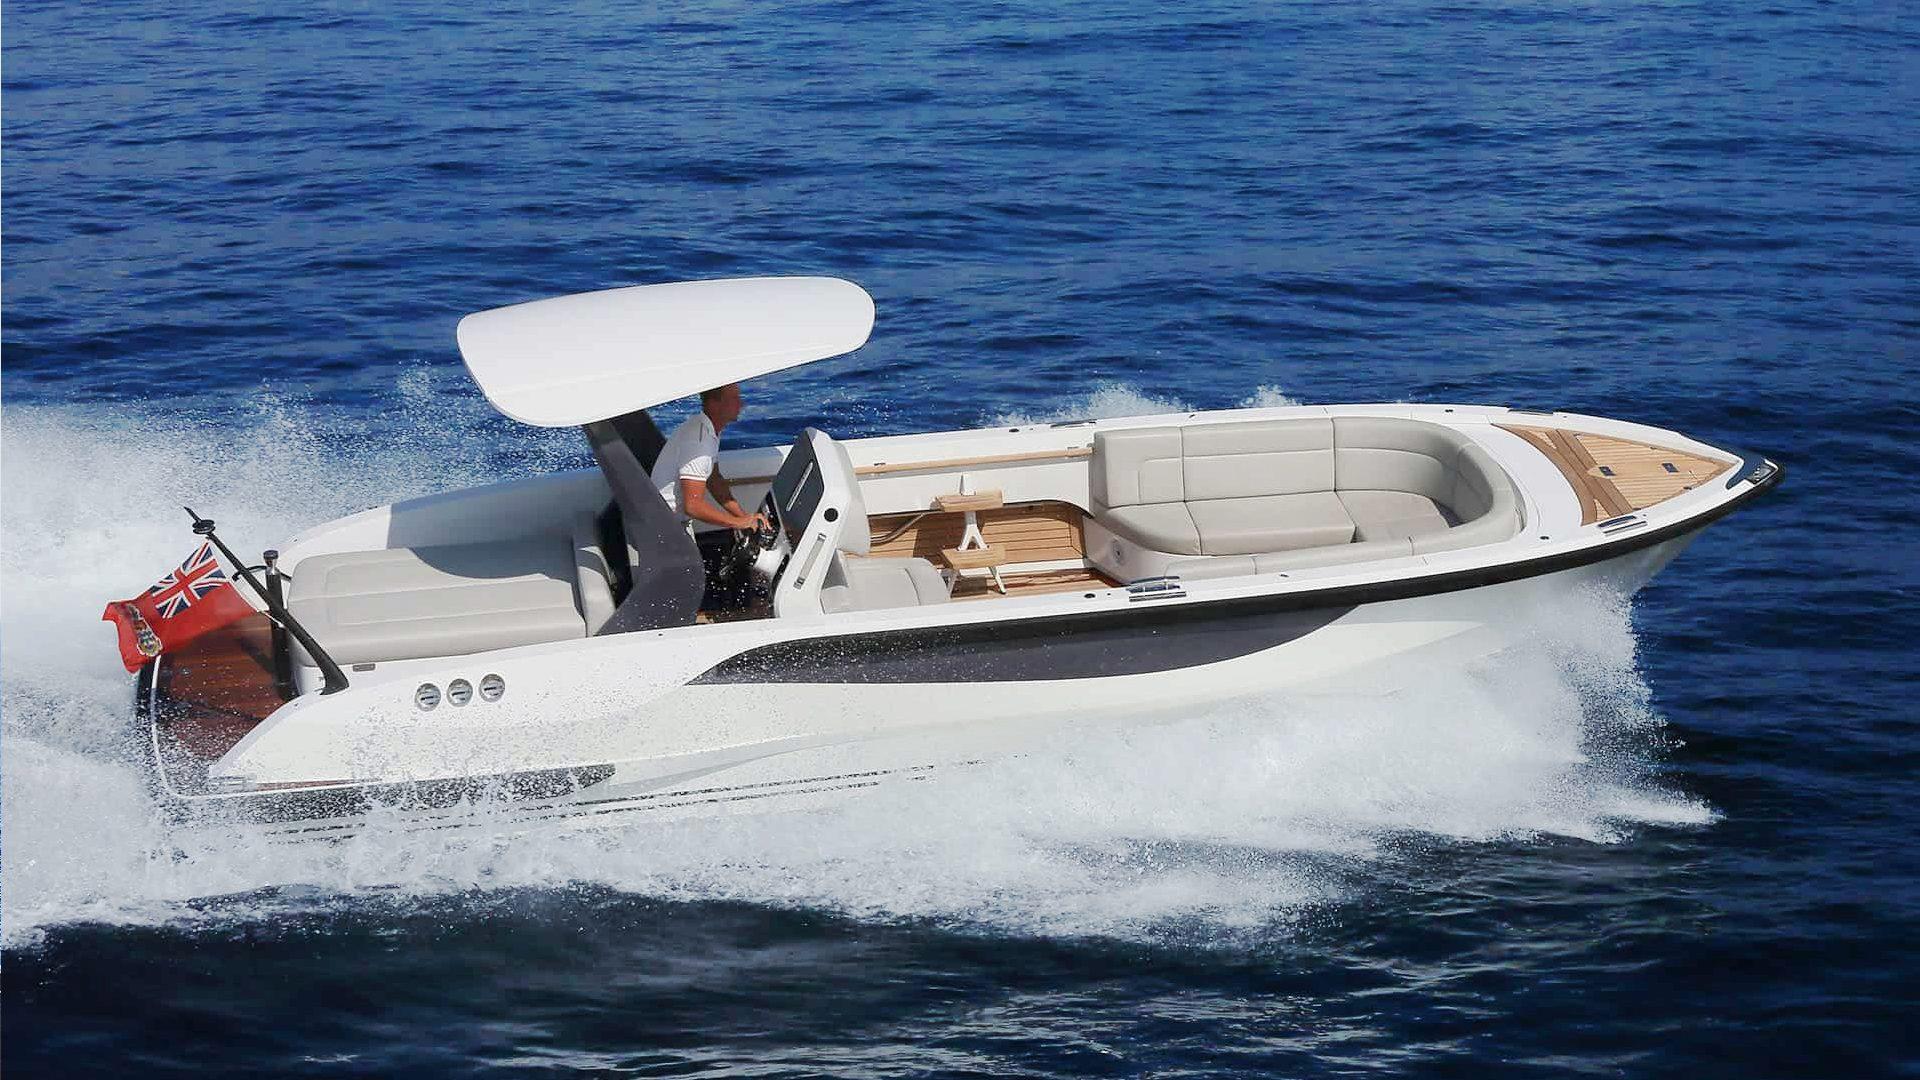 Superyacht Tender luxury open boat designed by Hamid Bekradi of HBD Studios